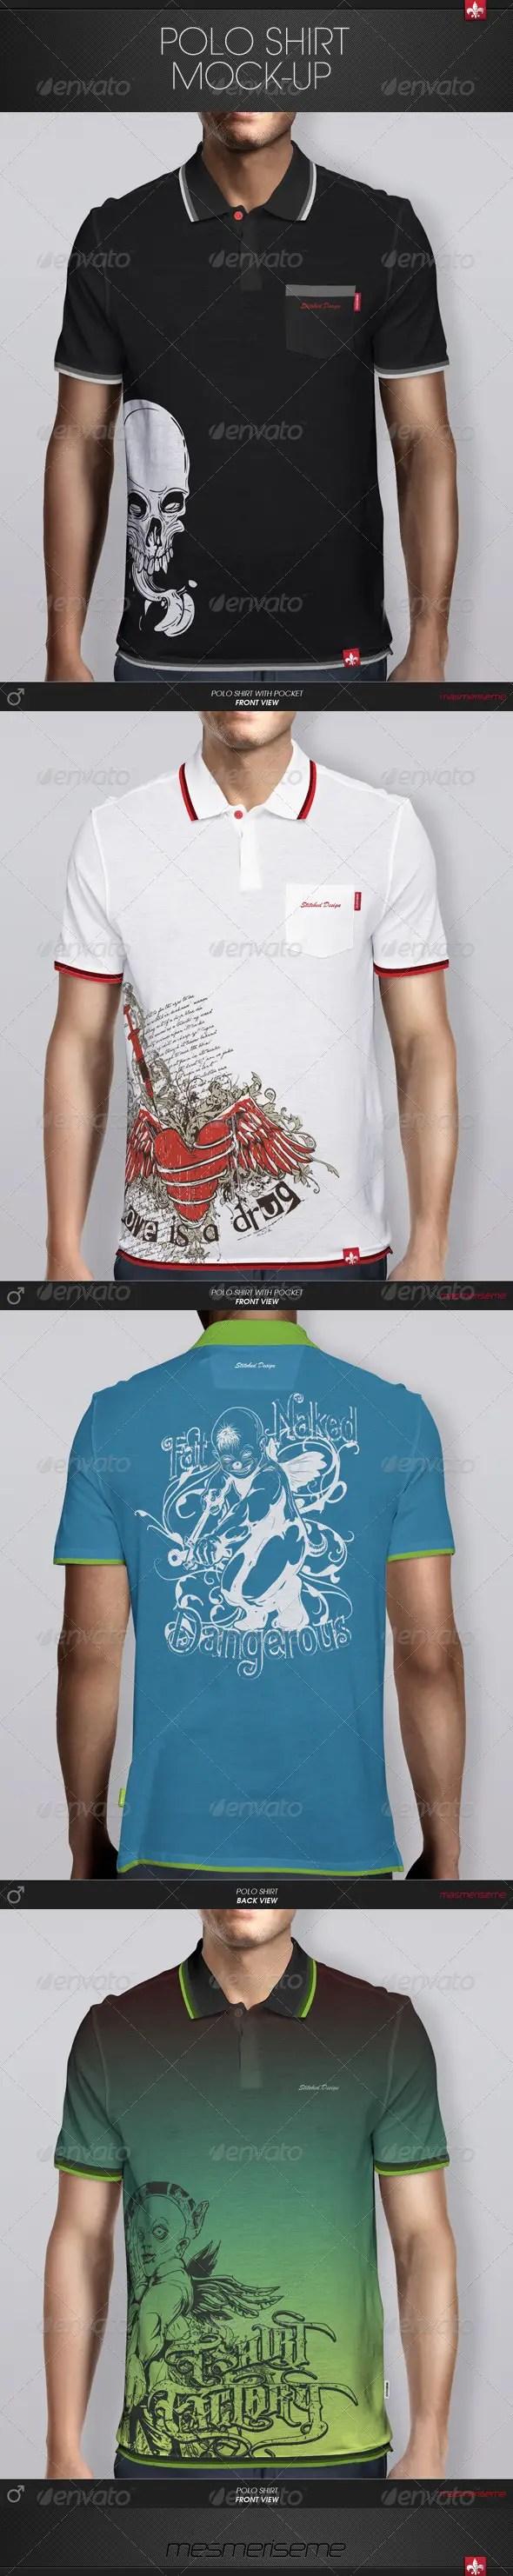 Polo Shirt Mockup3